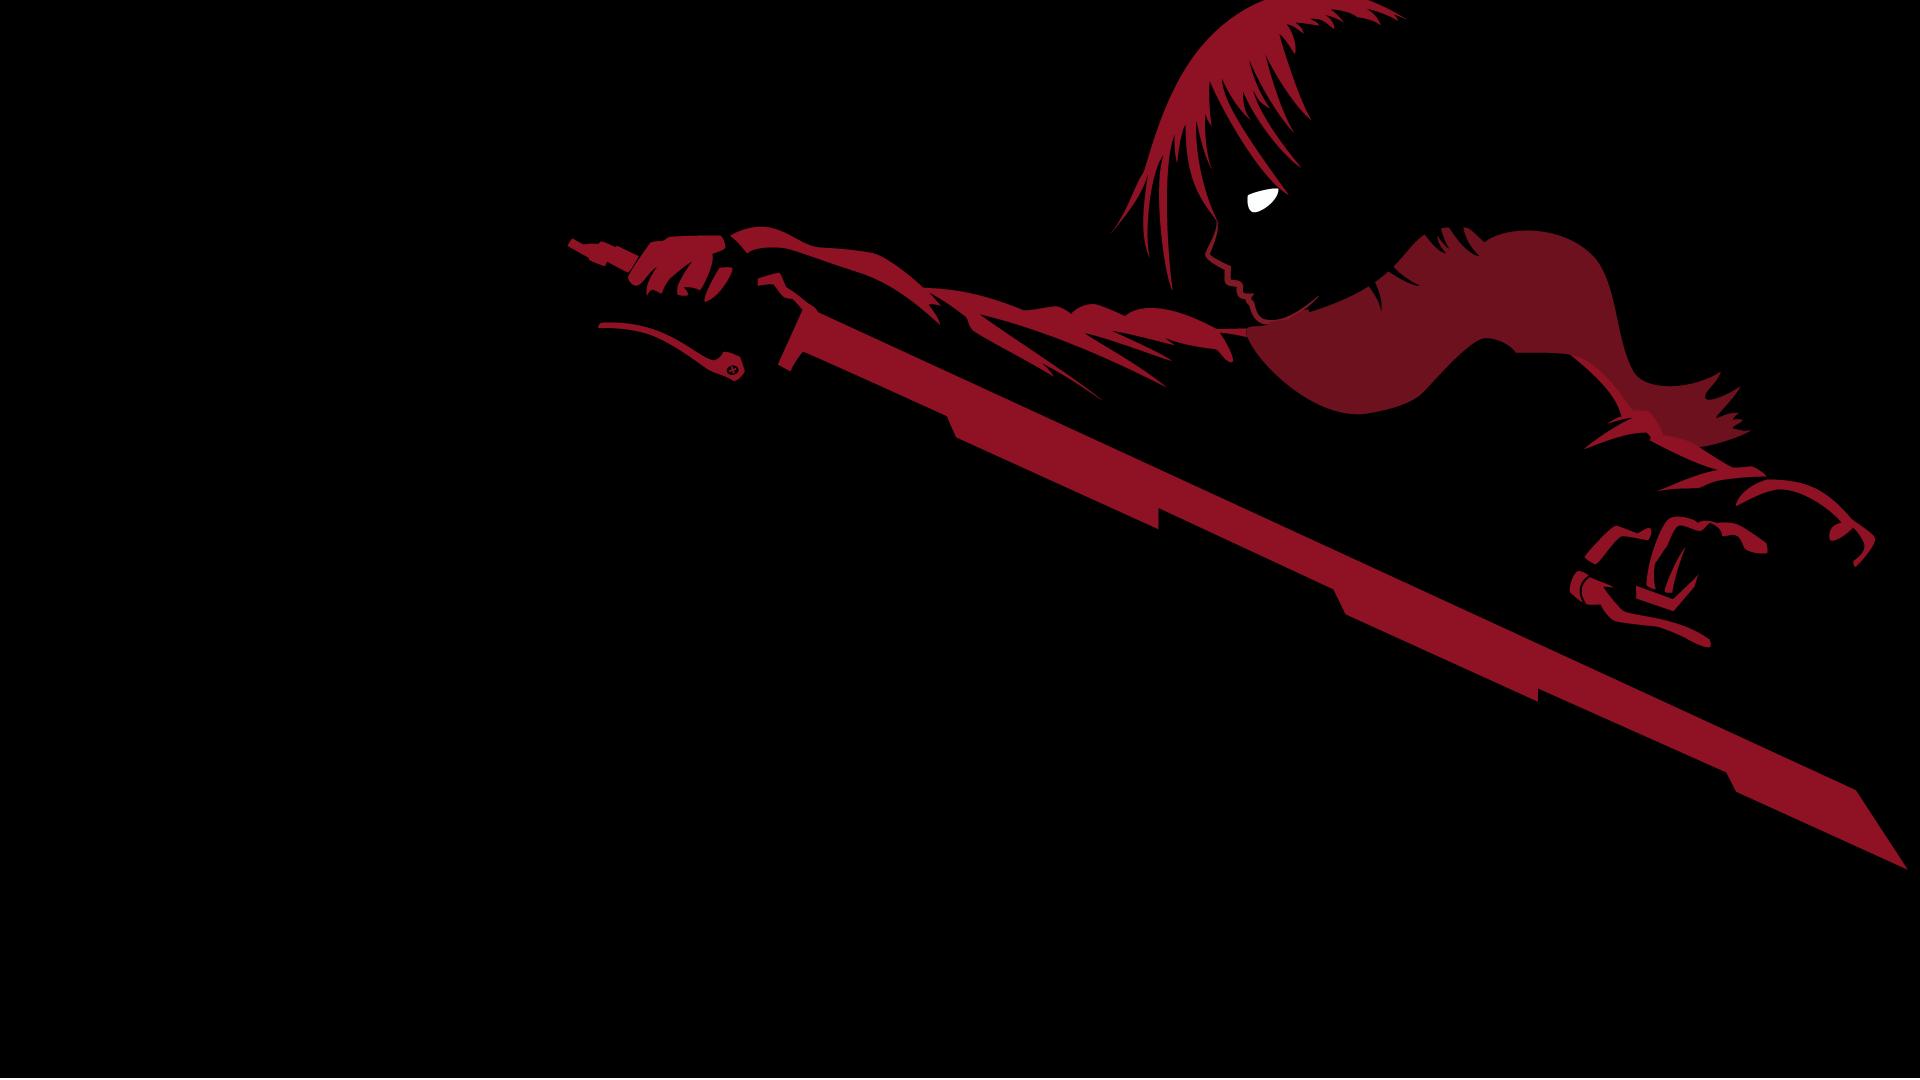 Wallpaper Illustration Anime Girls Minimalism Shingeki